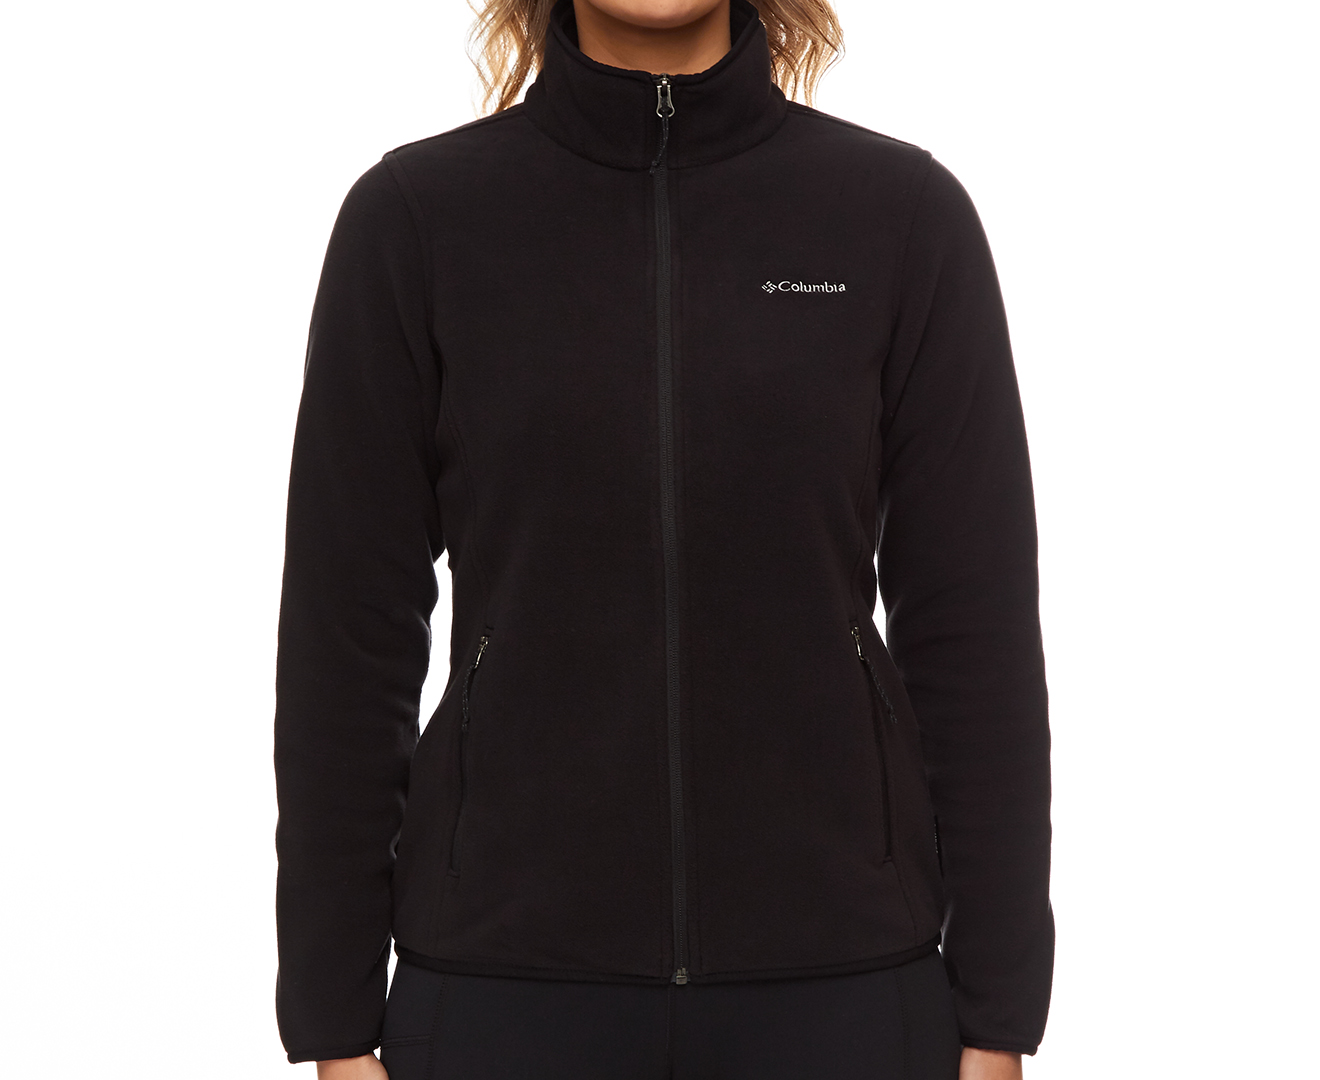 321754a47fca5 Columbia Women s Fuller Ridge Fleece Jacket - Black